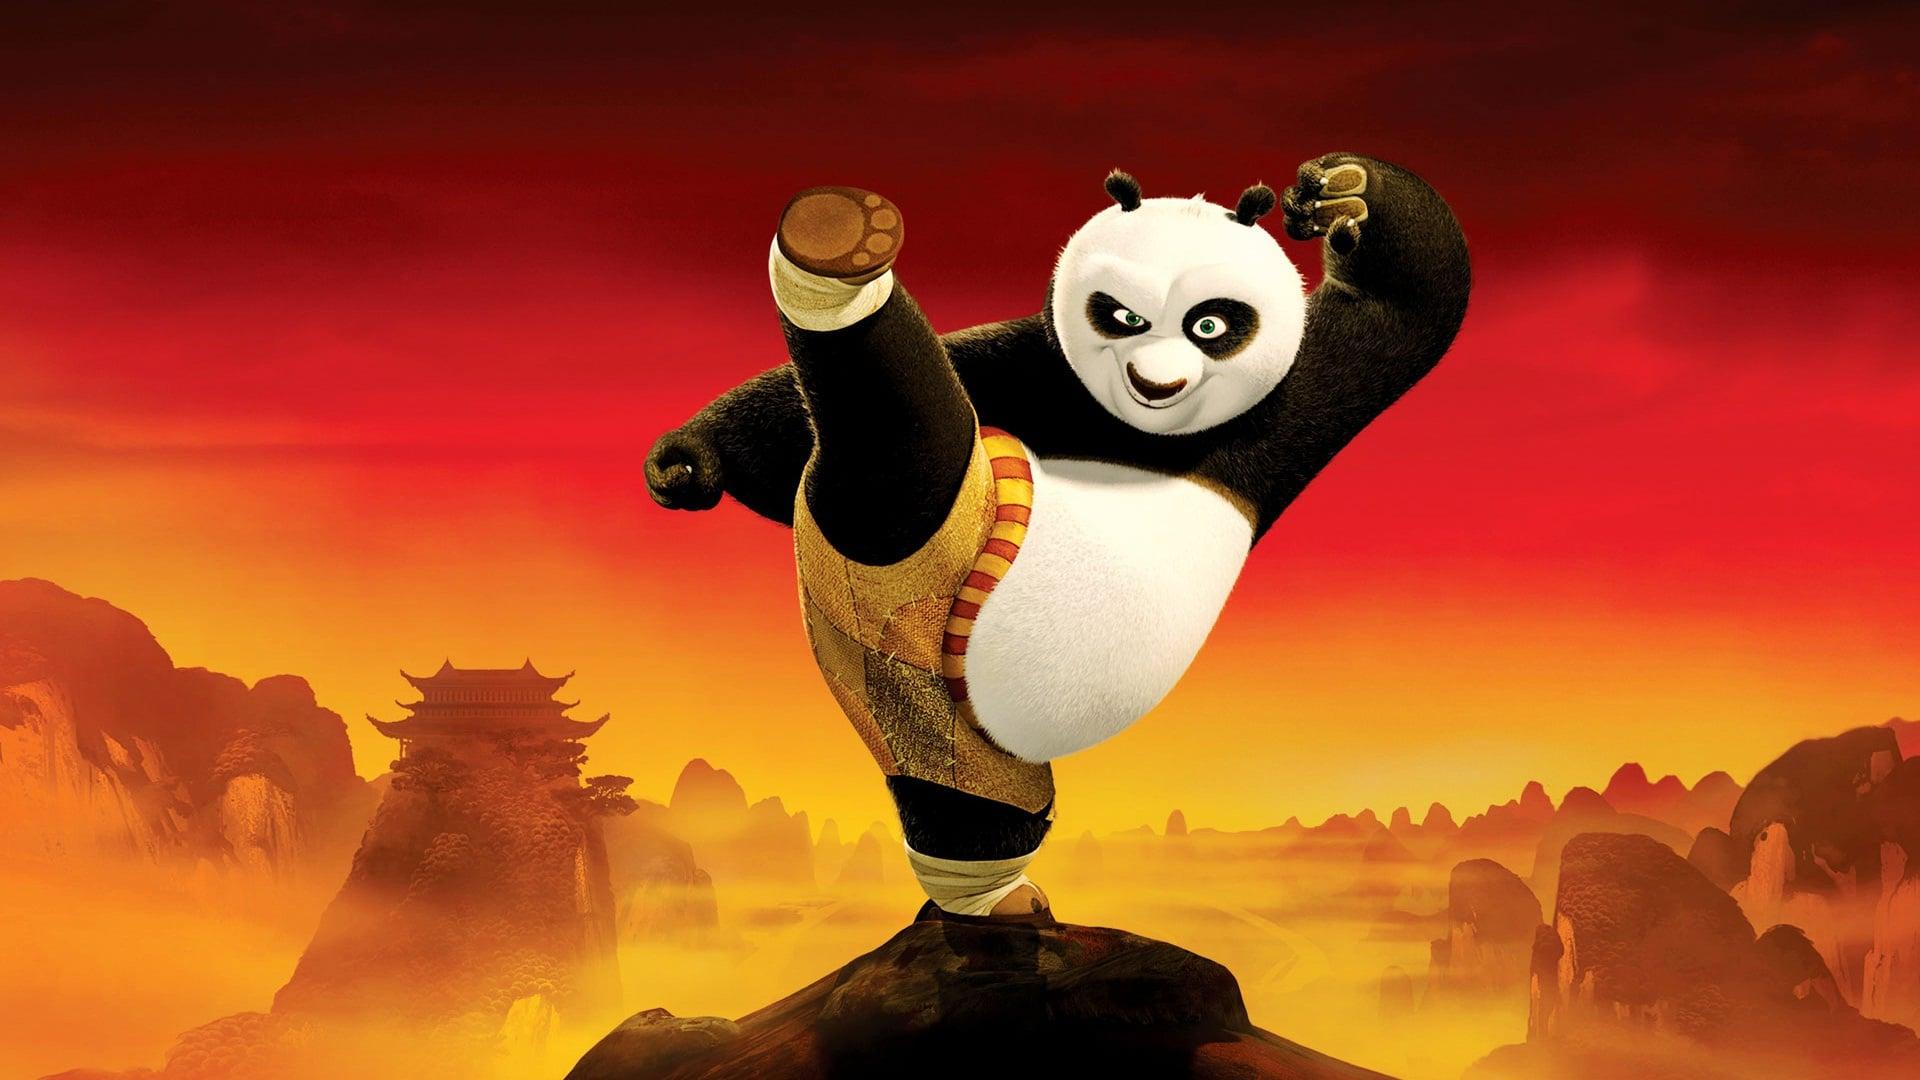 Kung Fu Panda Wallpaper Wpt7006409   Full Hd Kung Fu Panda 1920x1080